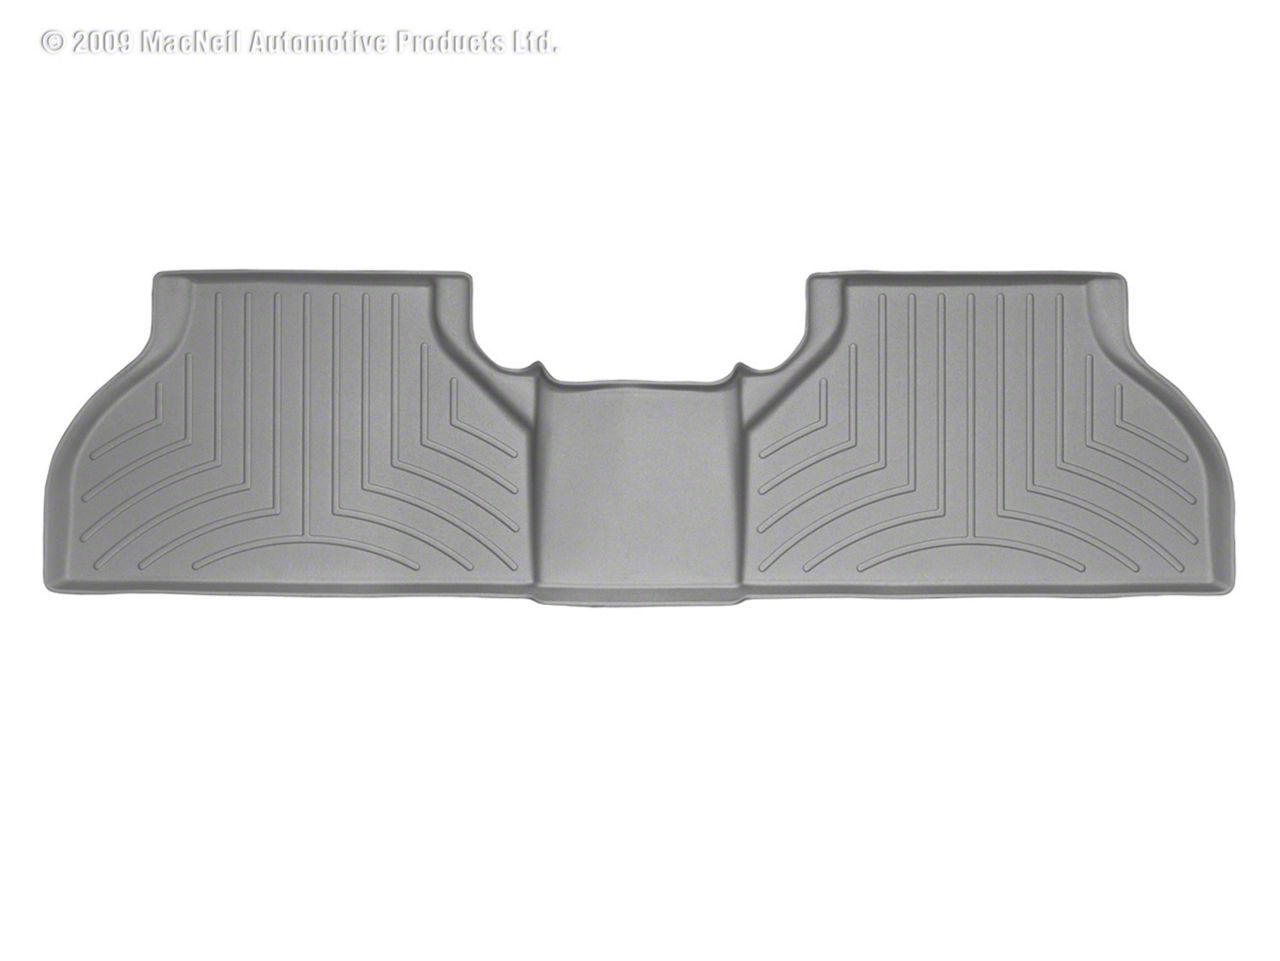 Weathertech DigitalFit Rear Floor Liner - Gray (16-19 Tacoma Double Cab)